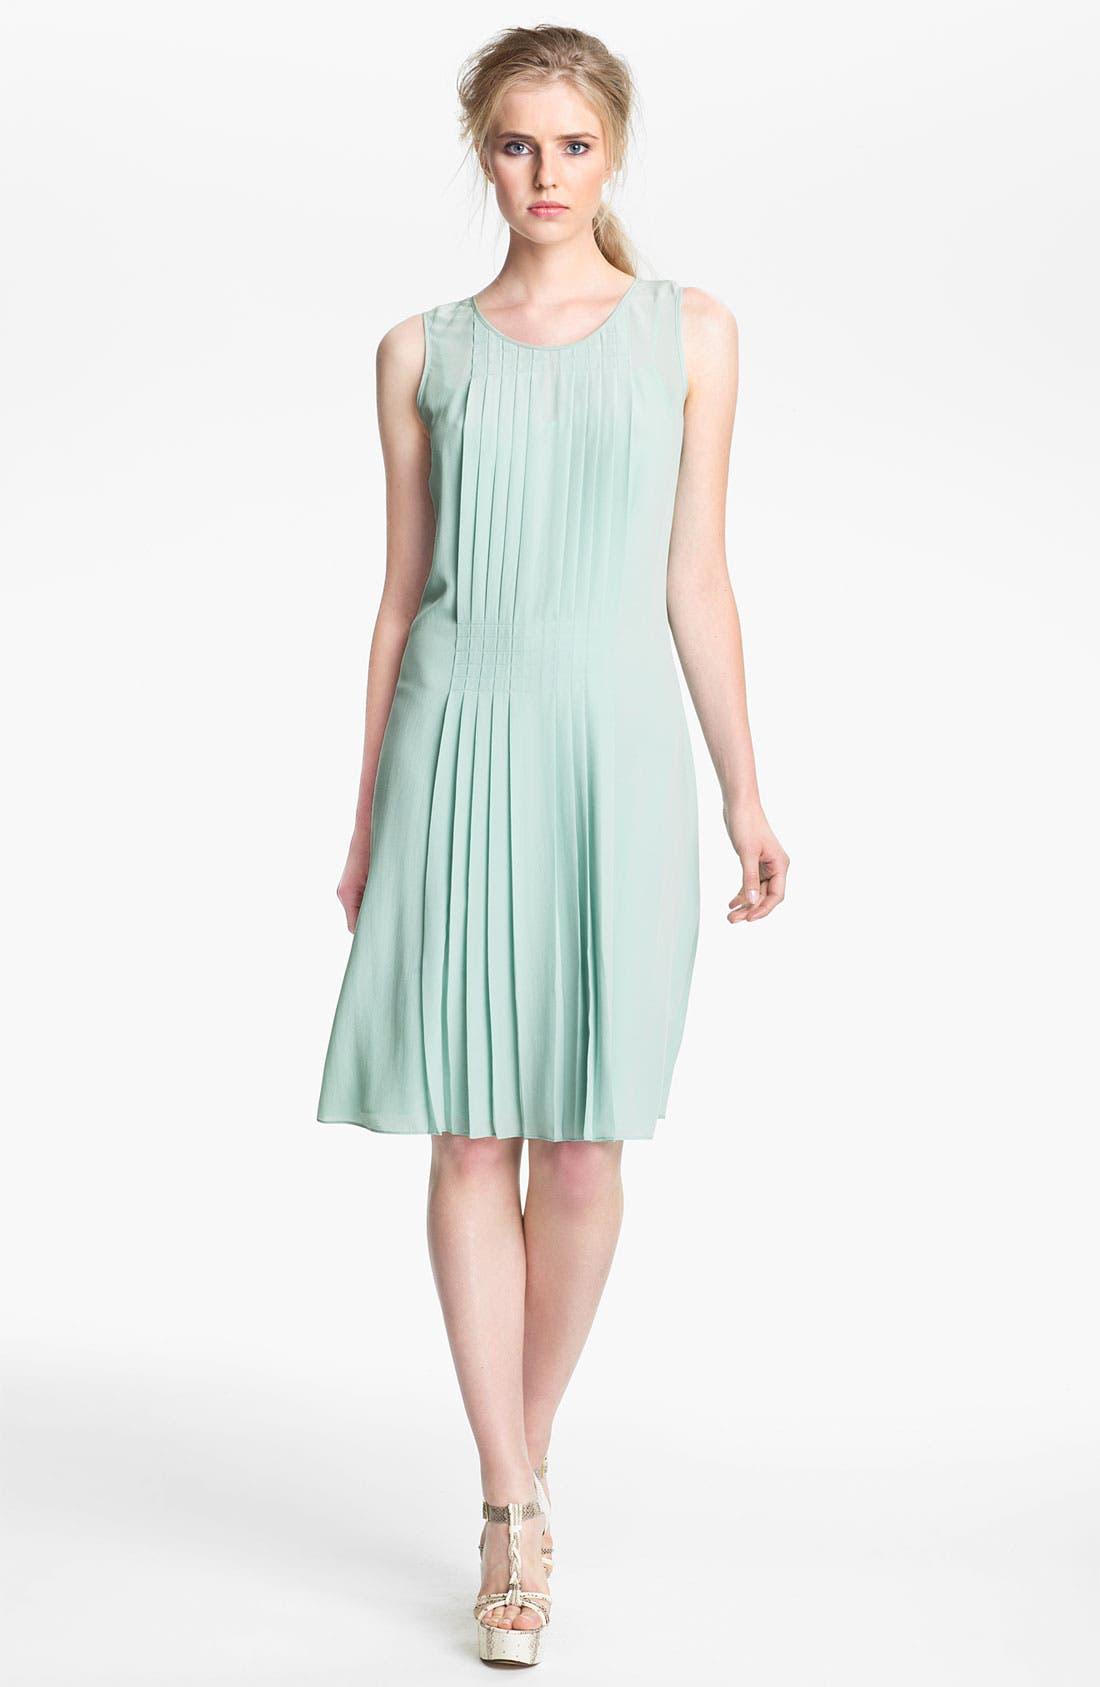 Alternate Image 1 Selected - Rachel Zoe 'Karlie' Pleated Shift Dress